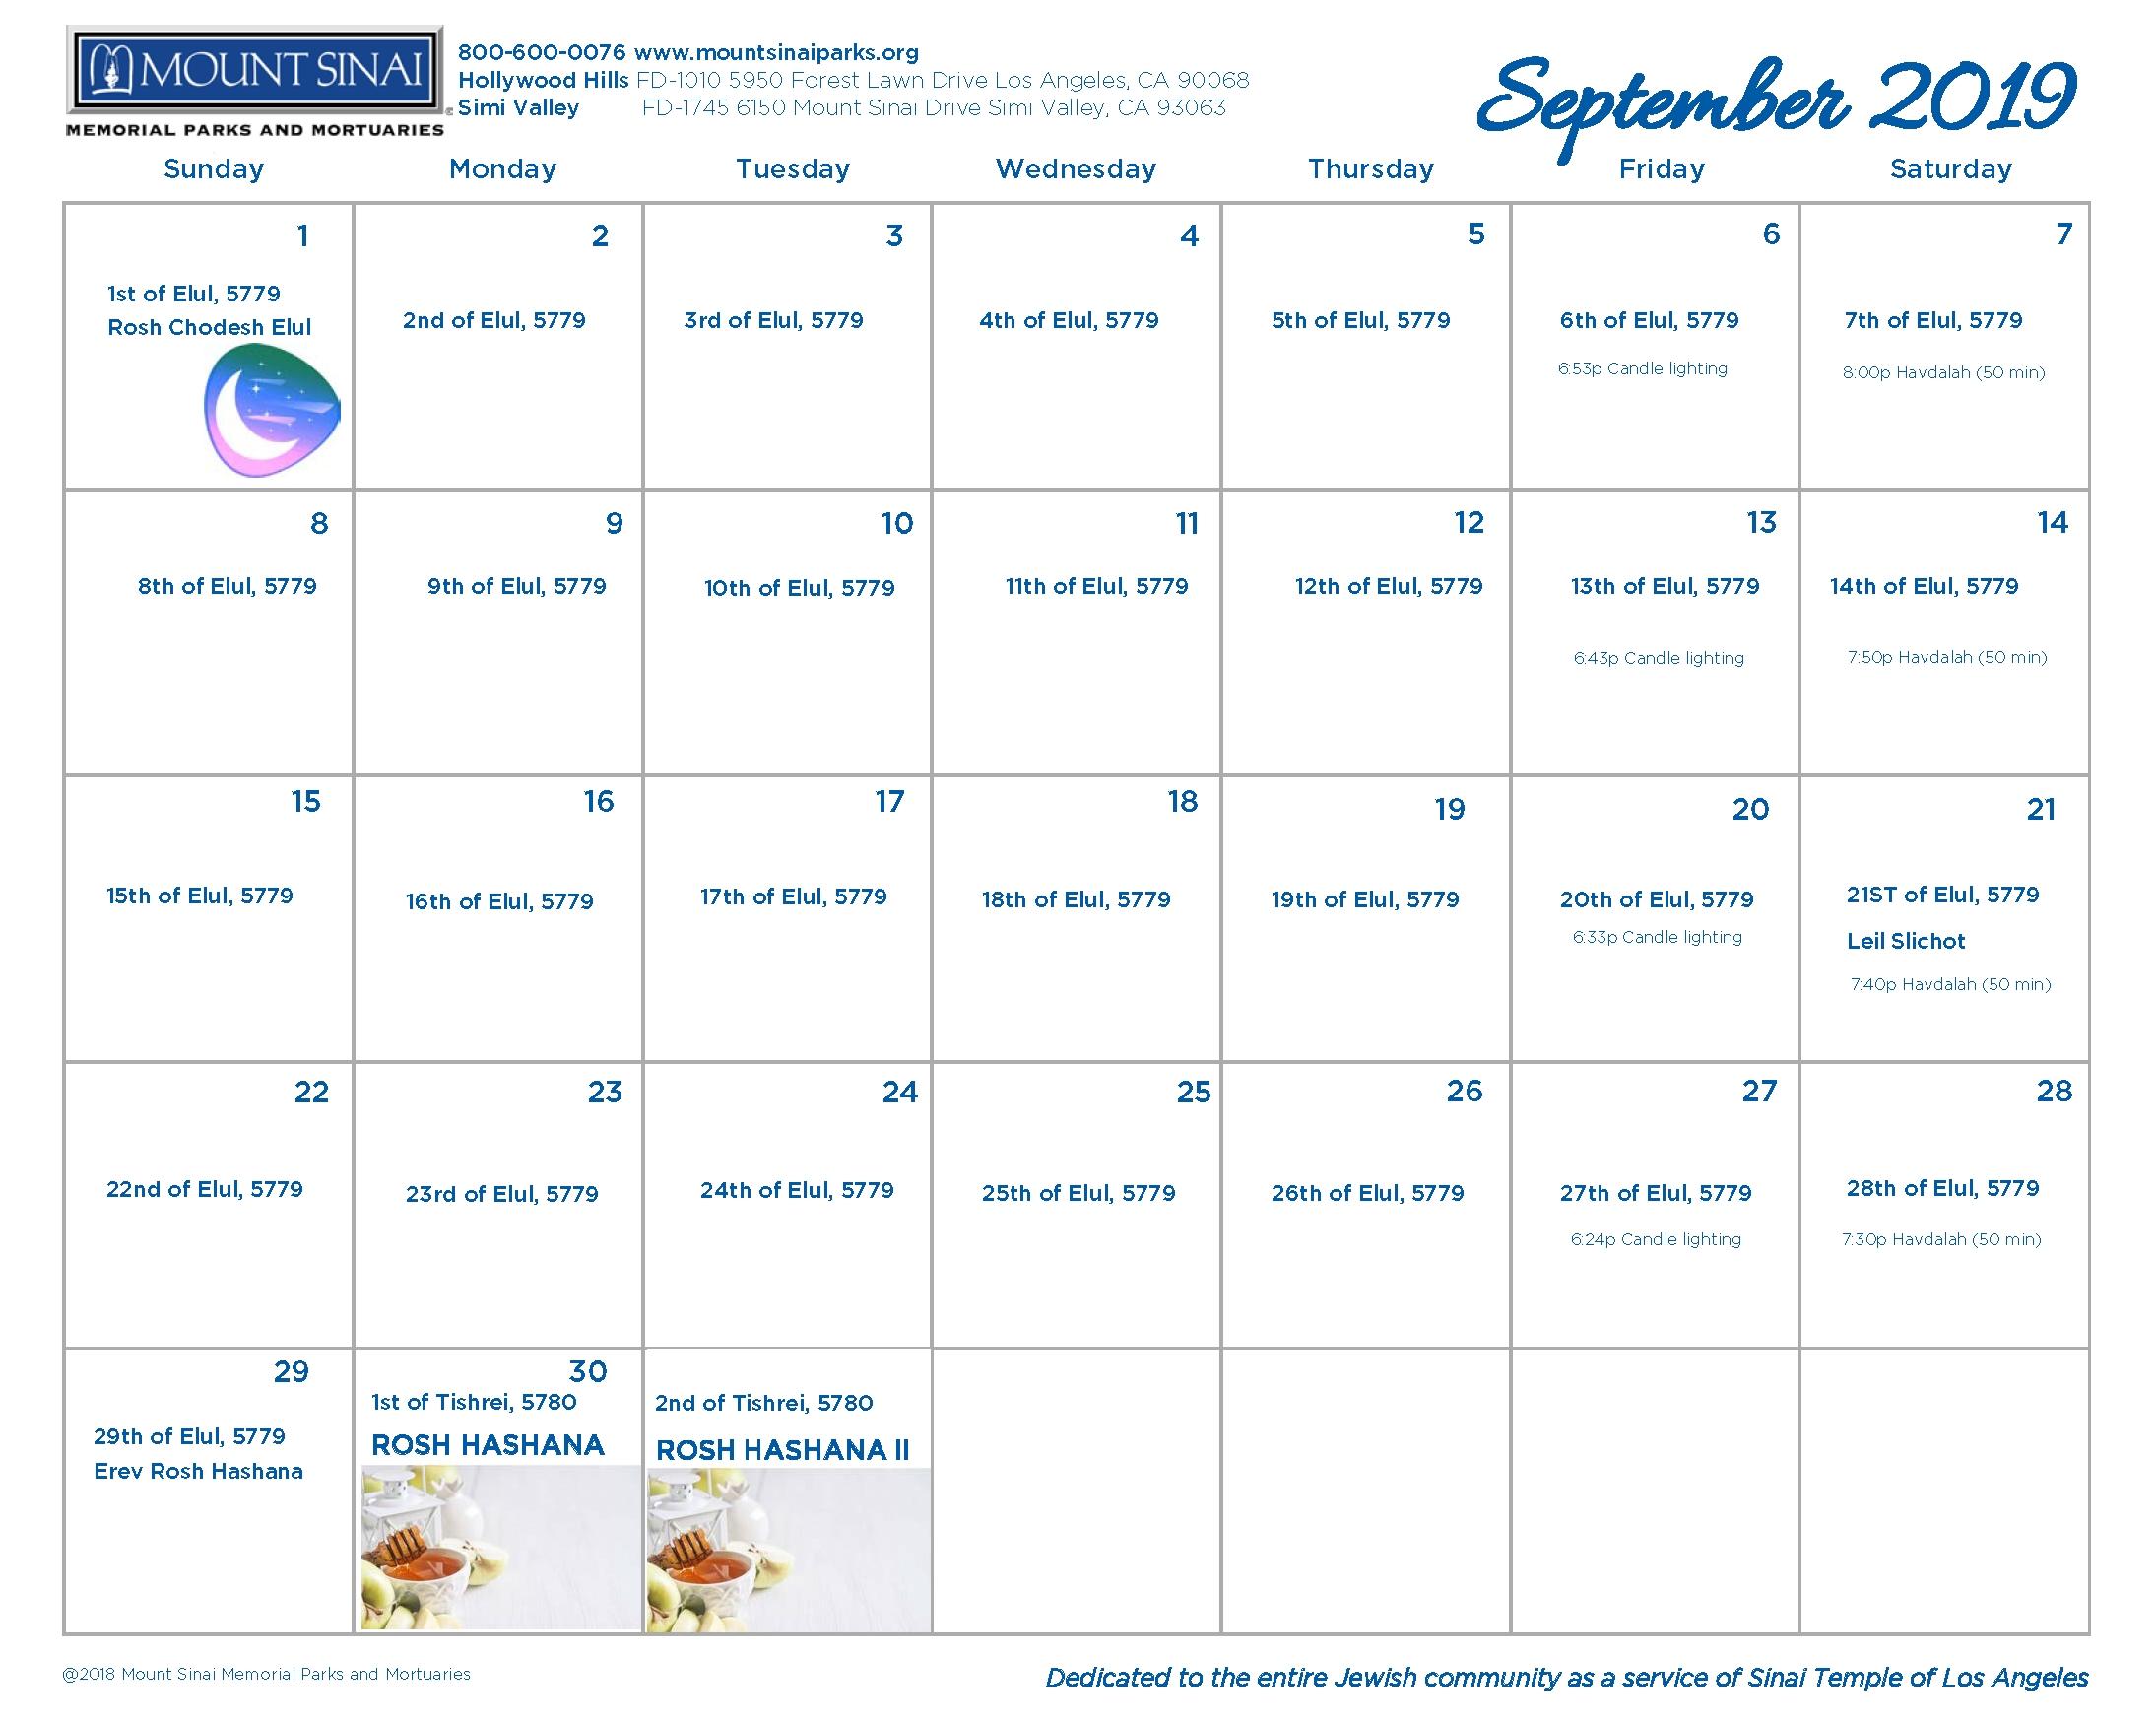 5779 Hebrew Calendar - Mount Sinai Memorial Parks And Mortuaries with regard to Free Hebraic Calendar 2019 2020